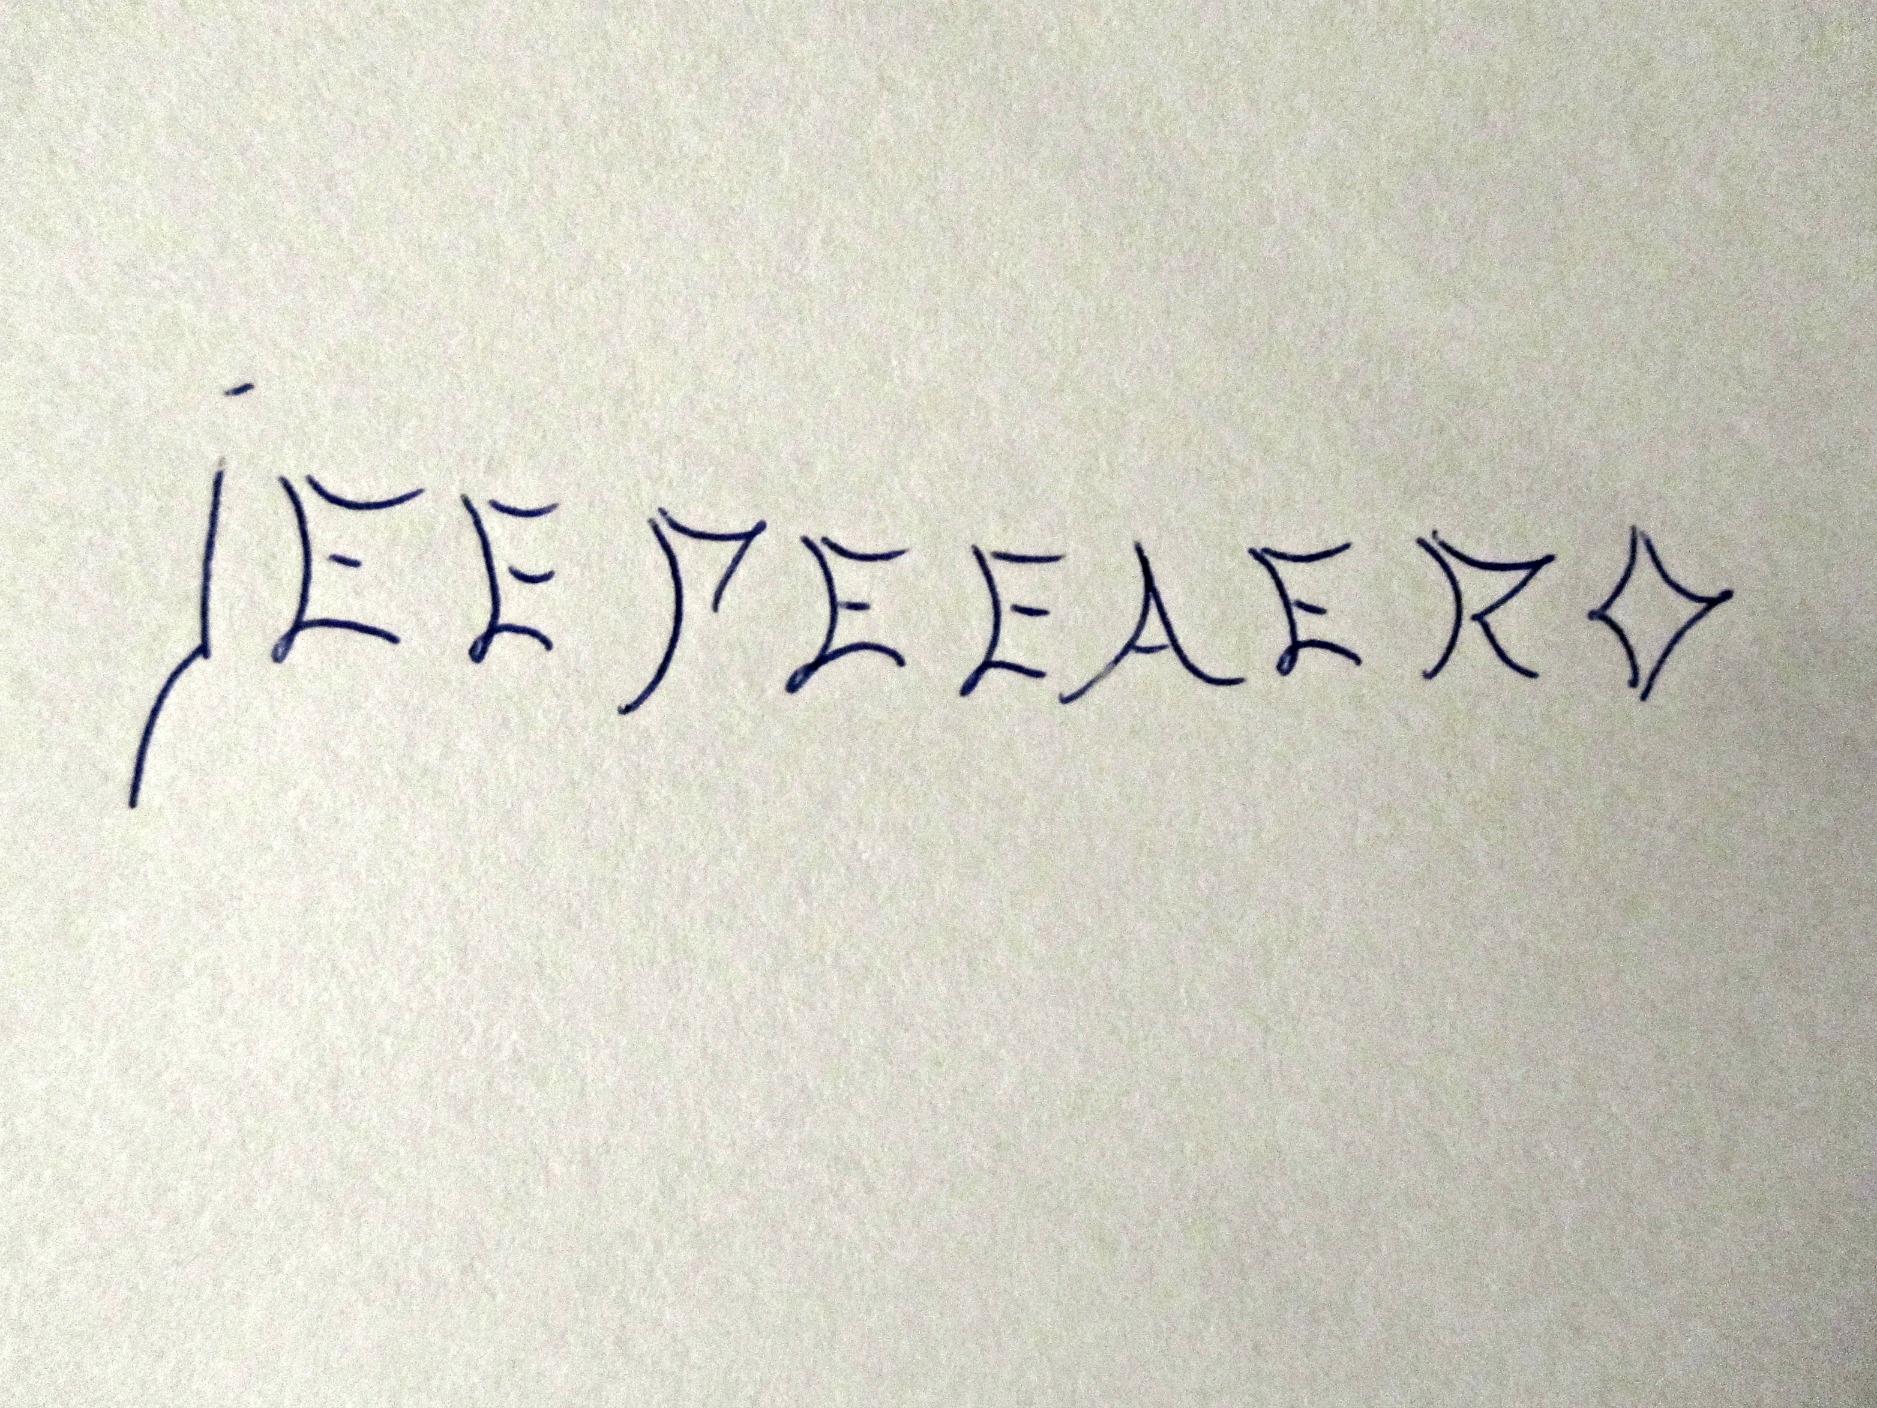 Jeepeeaero Signature